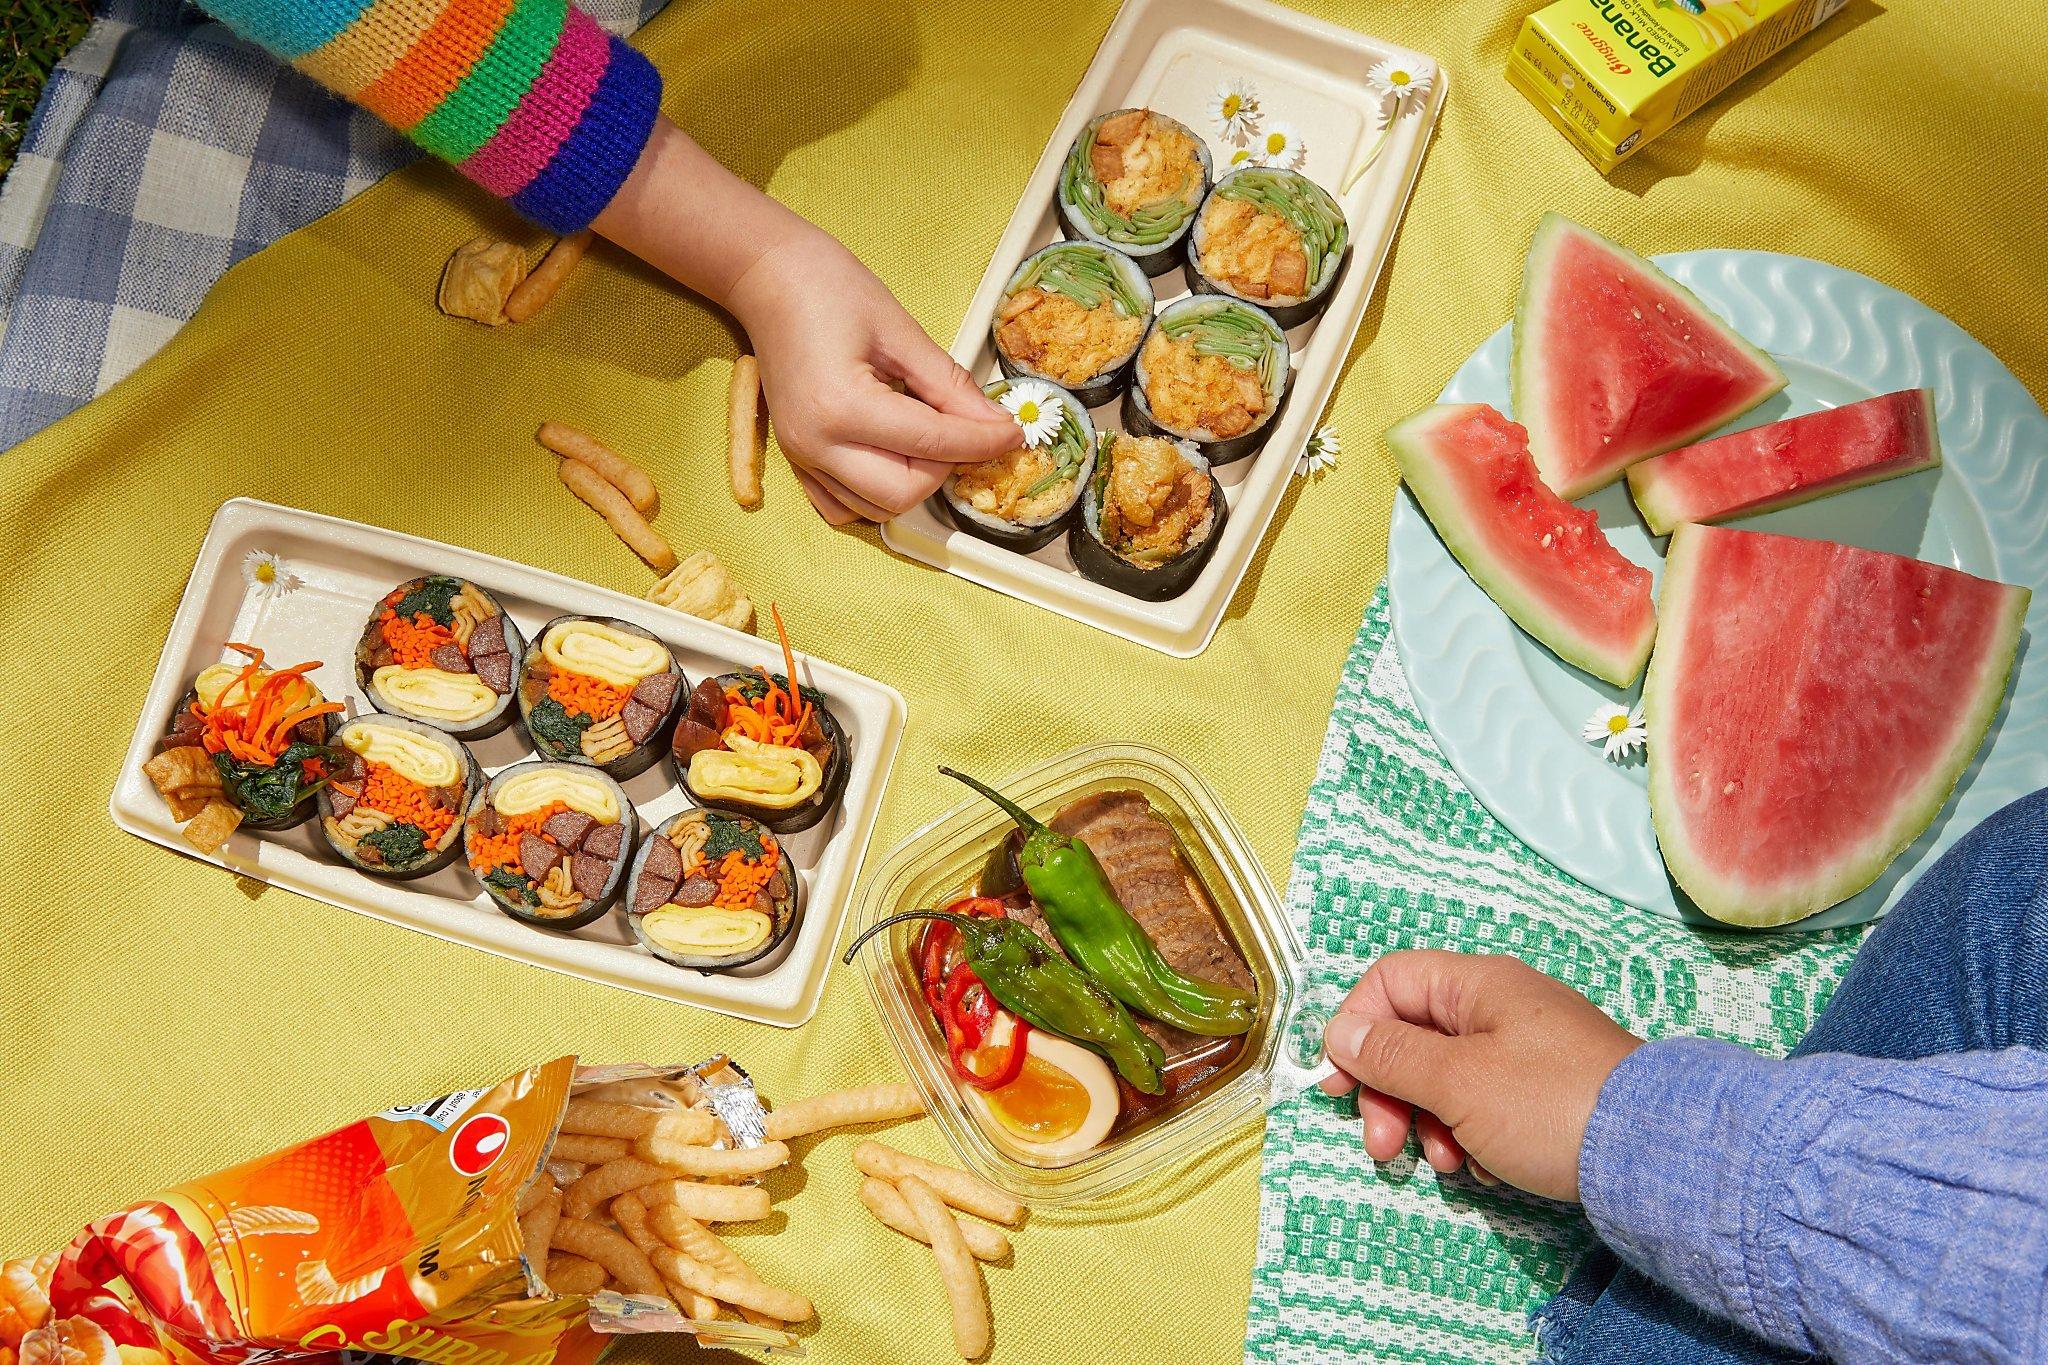 13 Bay Area restaurants offering prime picnic options